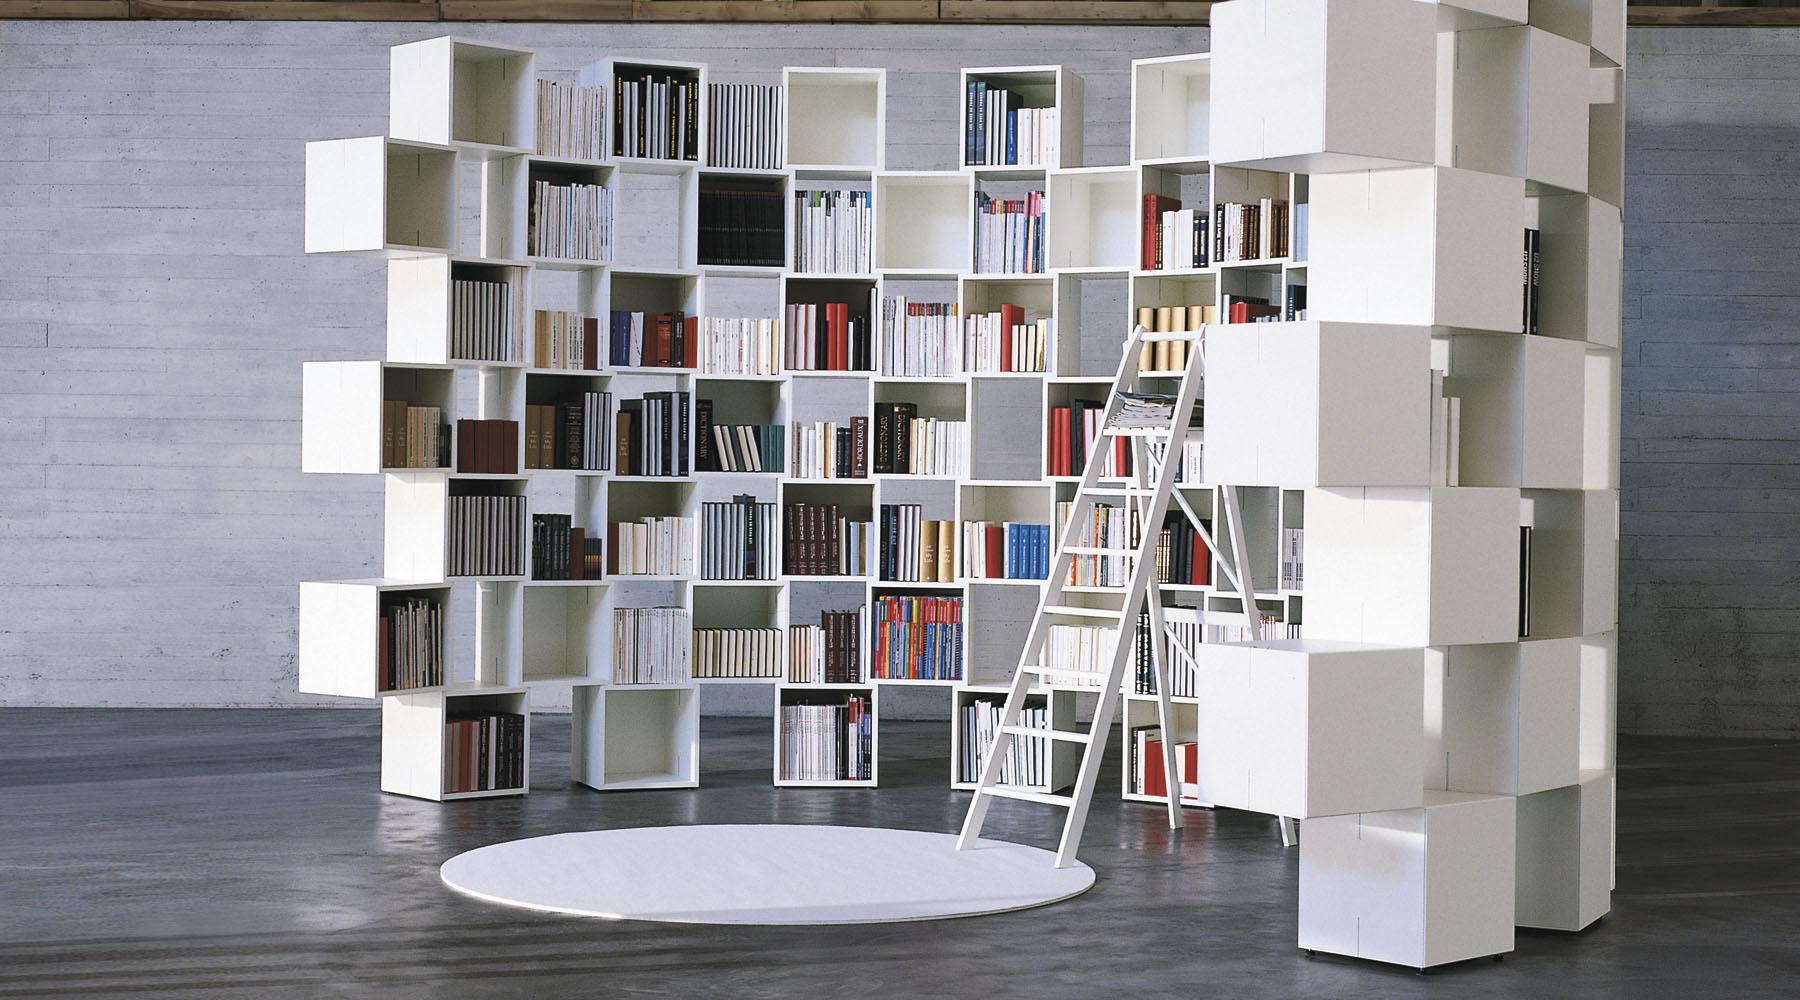 Delfanti arredamenti net storage for Cubi libreria ikea